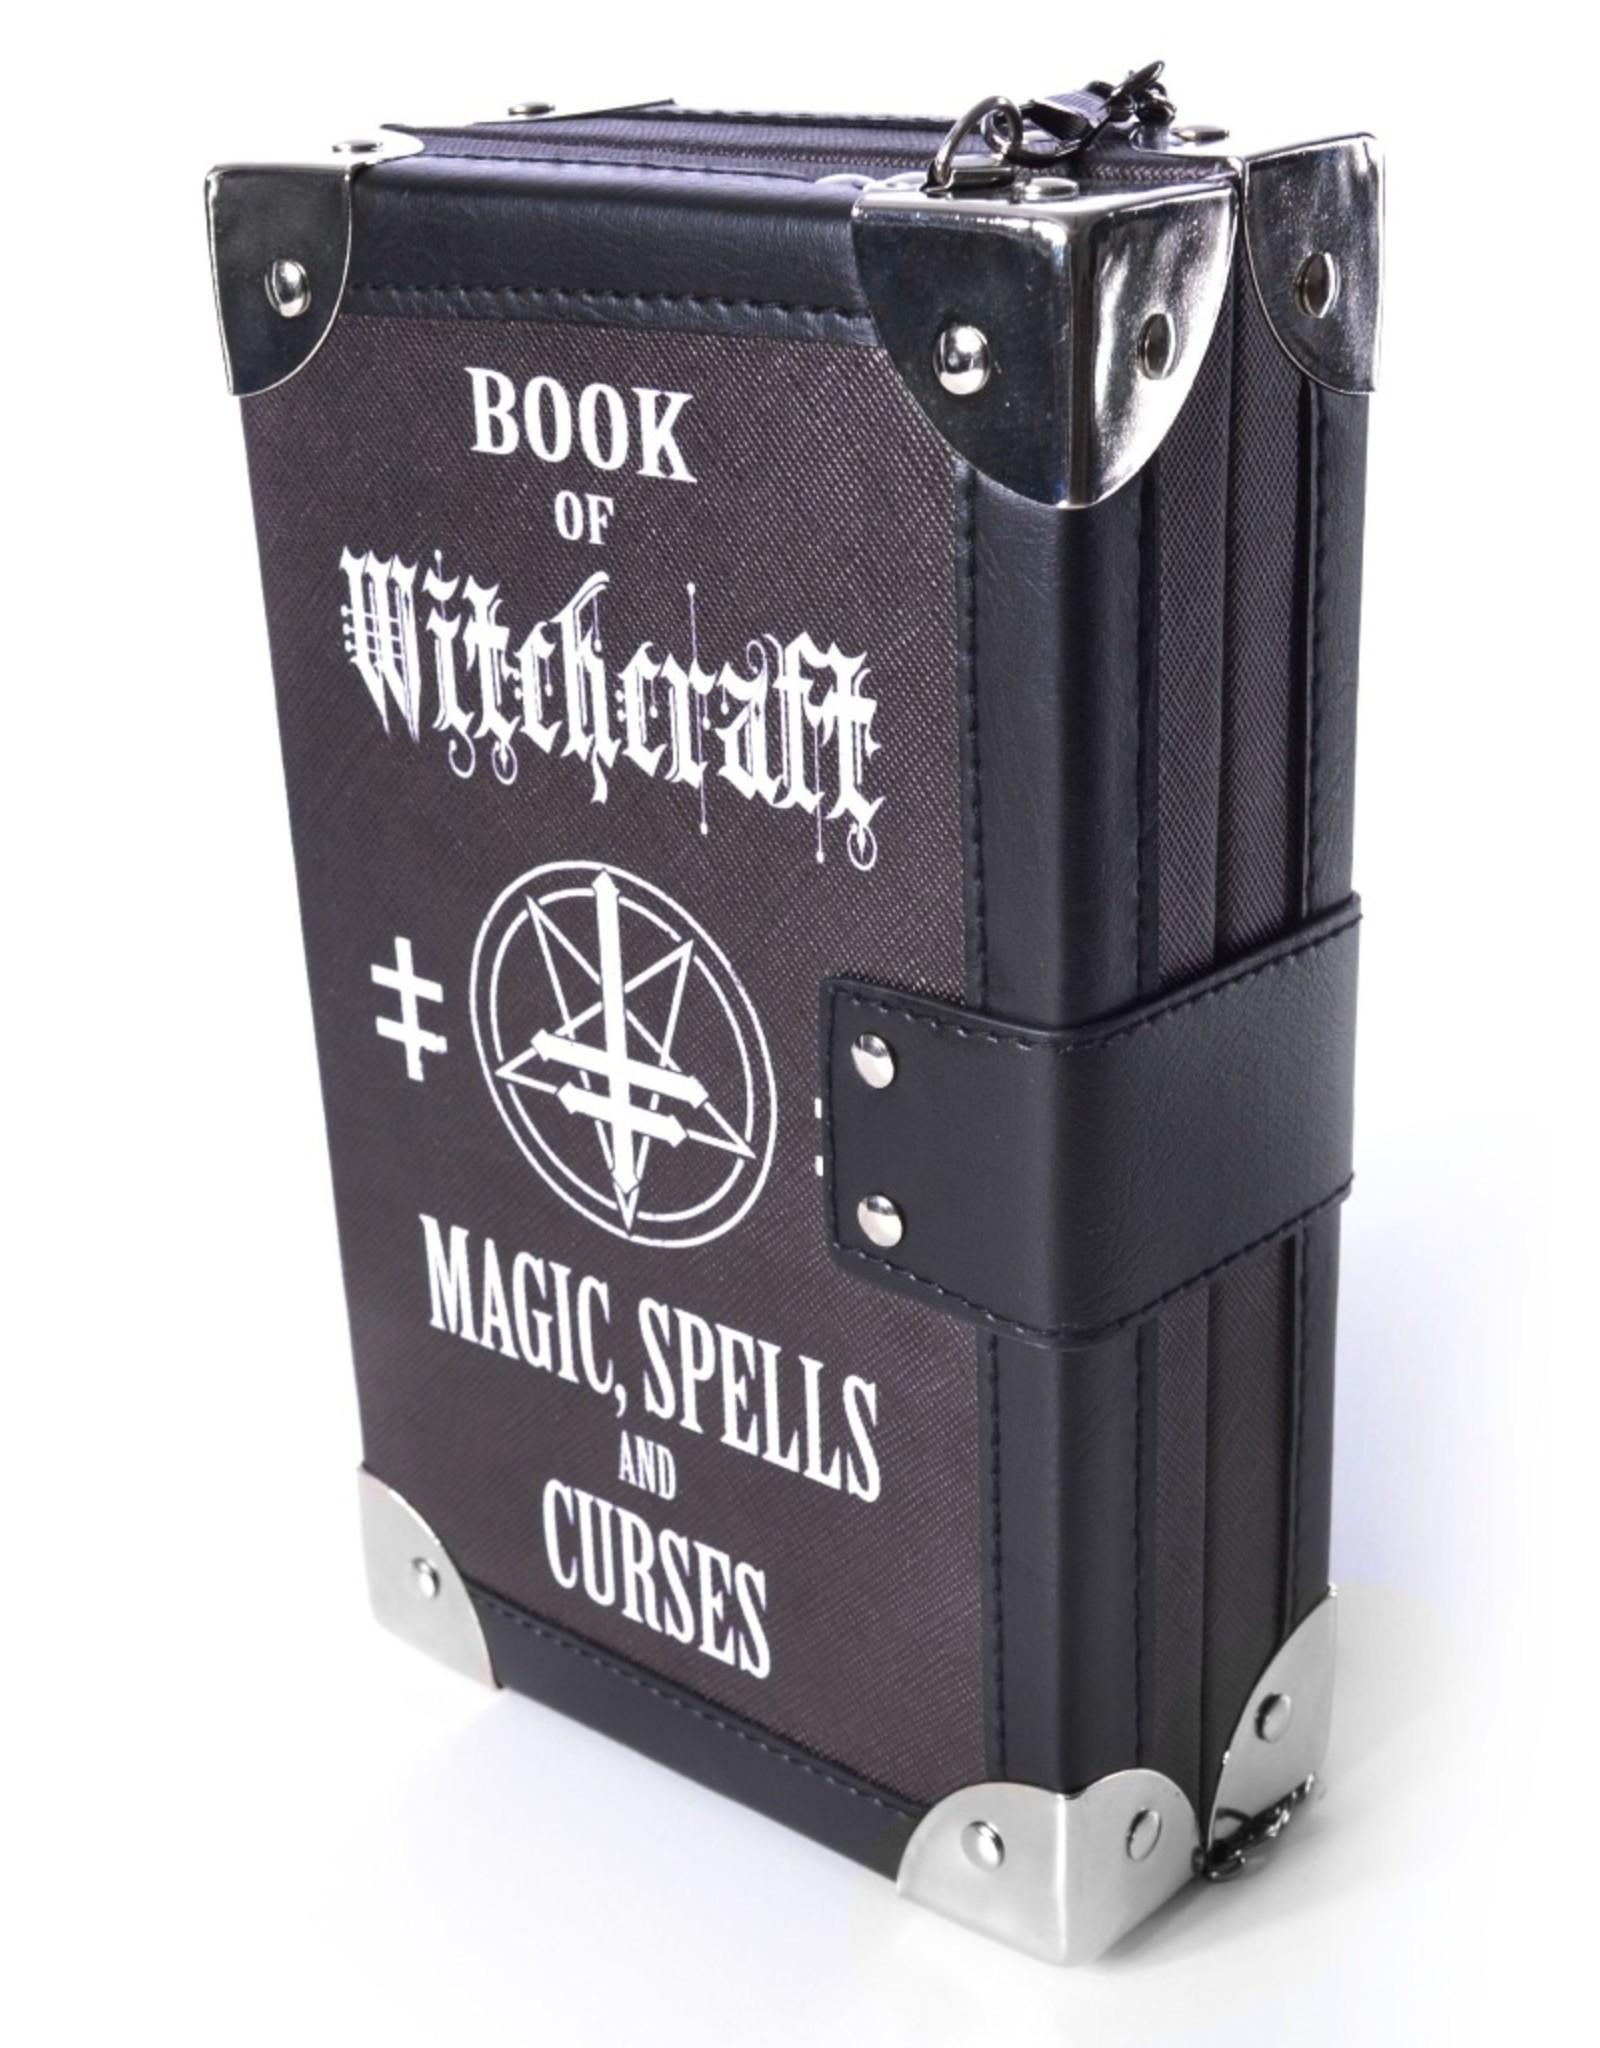 Cupcake Cult Gothic bags Steampunk bags - Cupcake Cult handbag Magic Spells